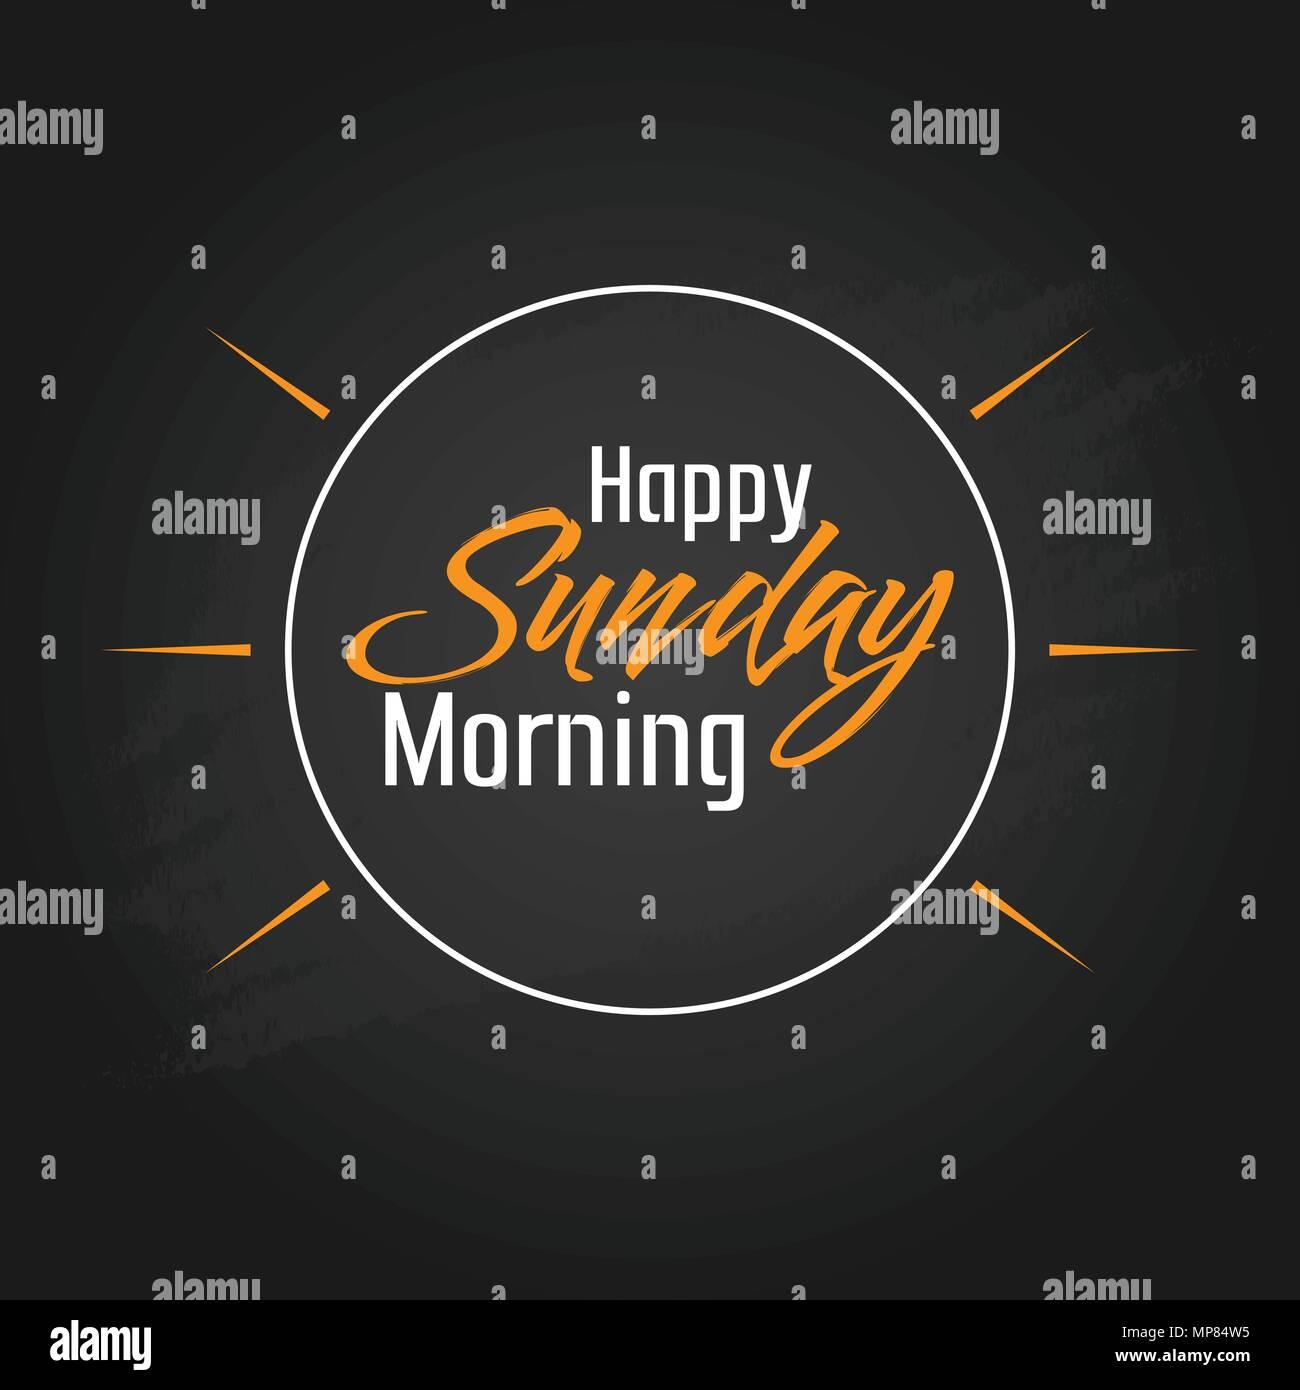 Schönen Sonntag Morgen Vector Template Design Vektor Abbildung